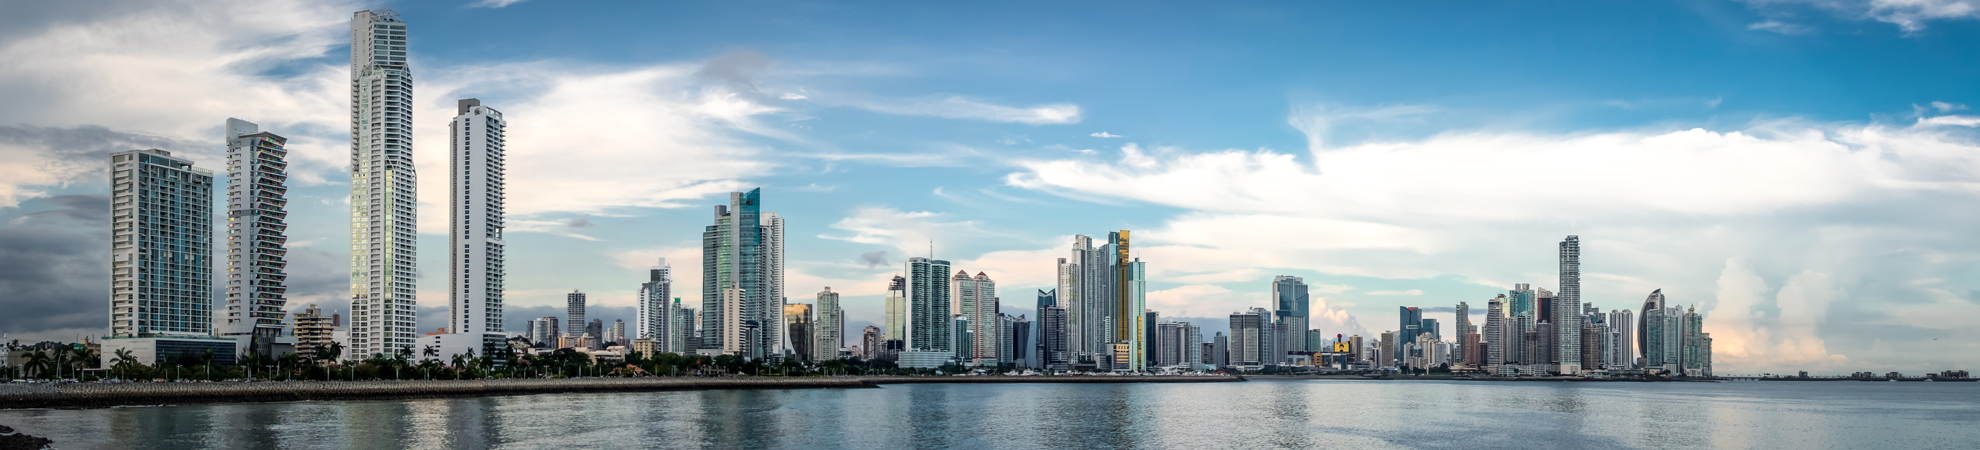 sejour Panama